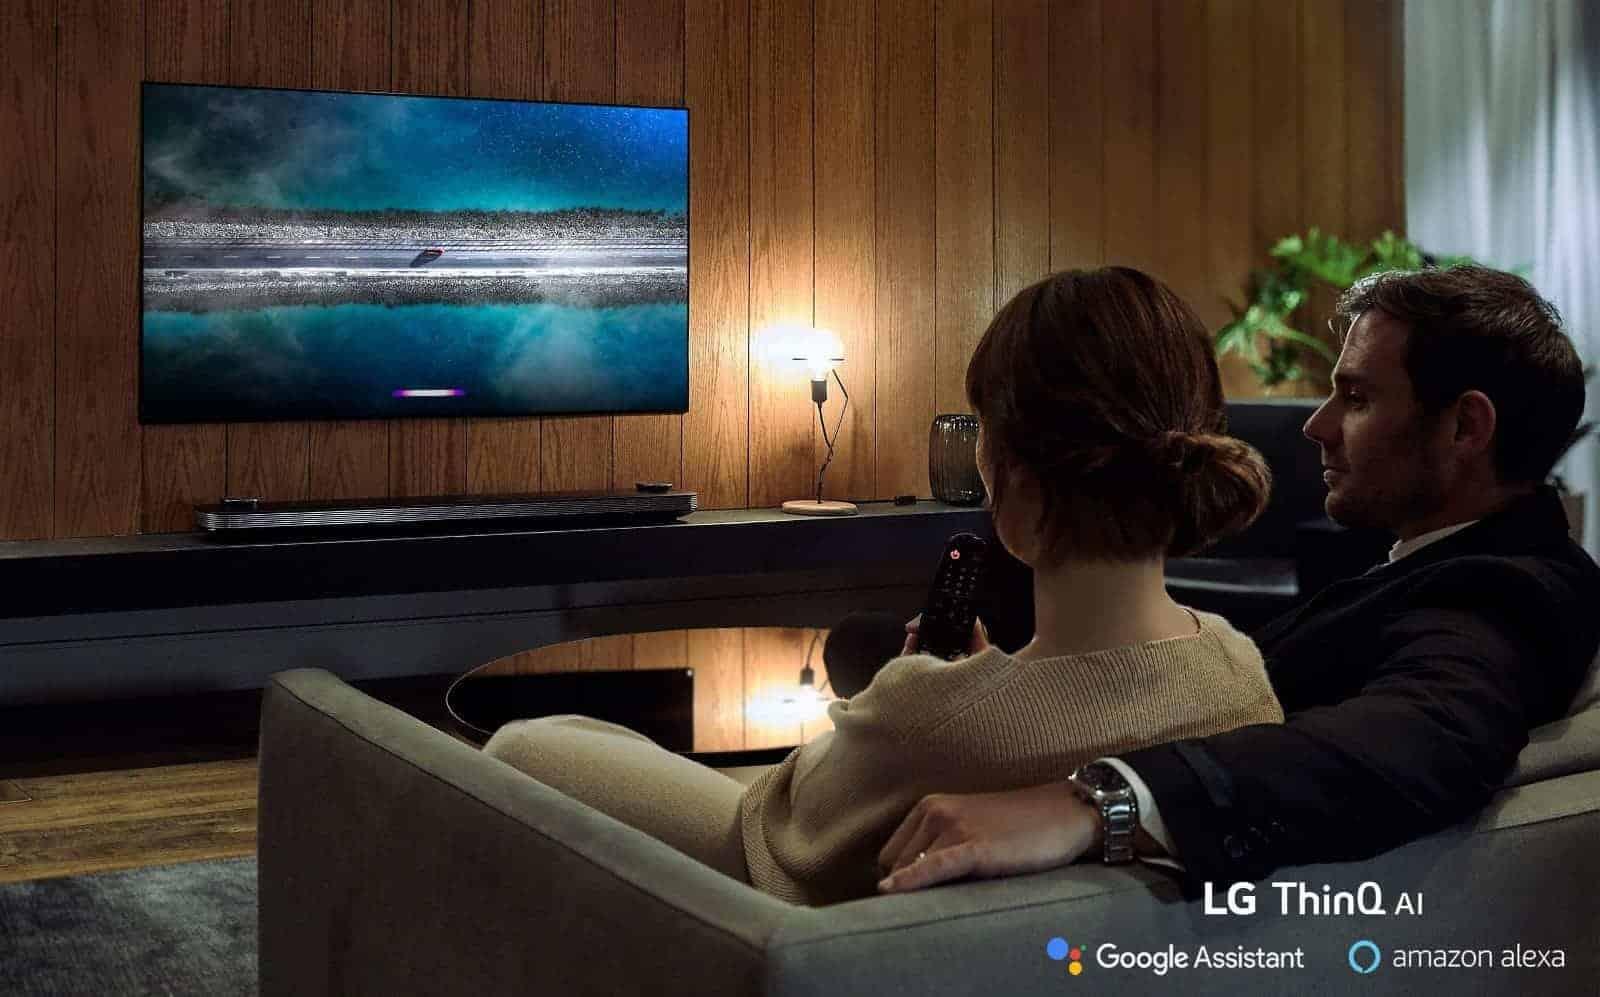 LG TV Amazon Alexa 02 presser